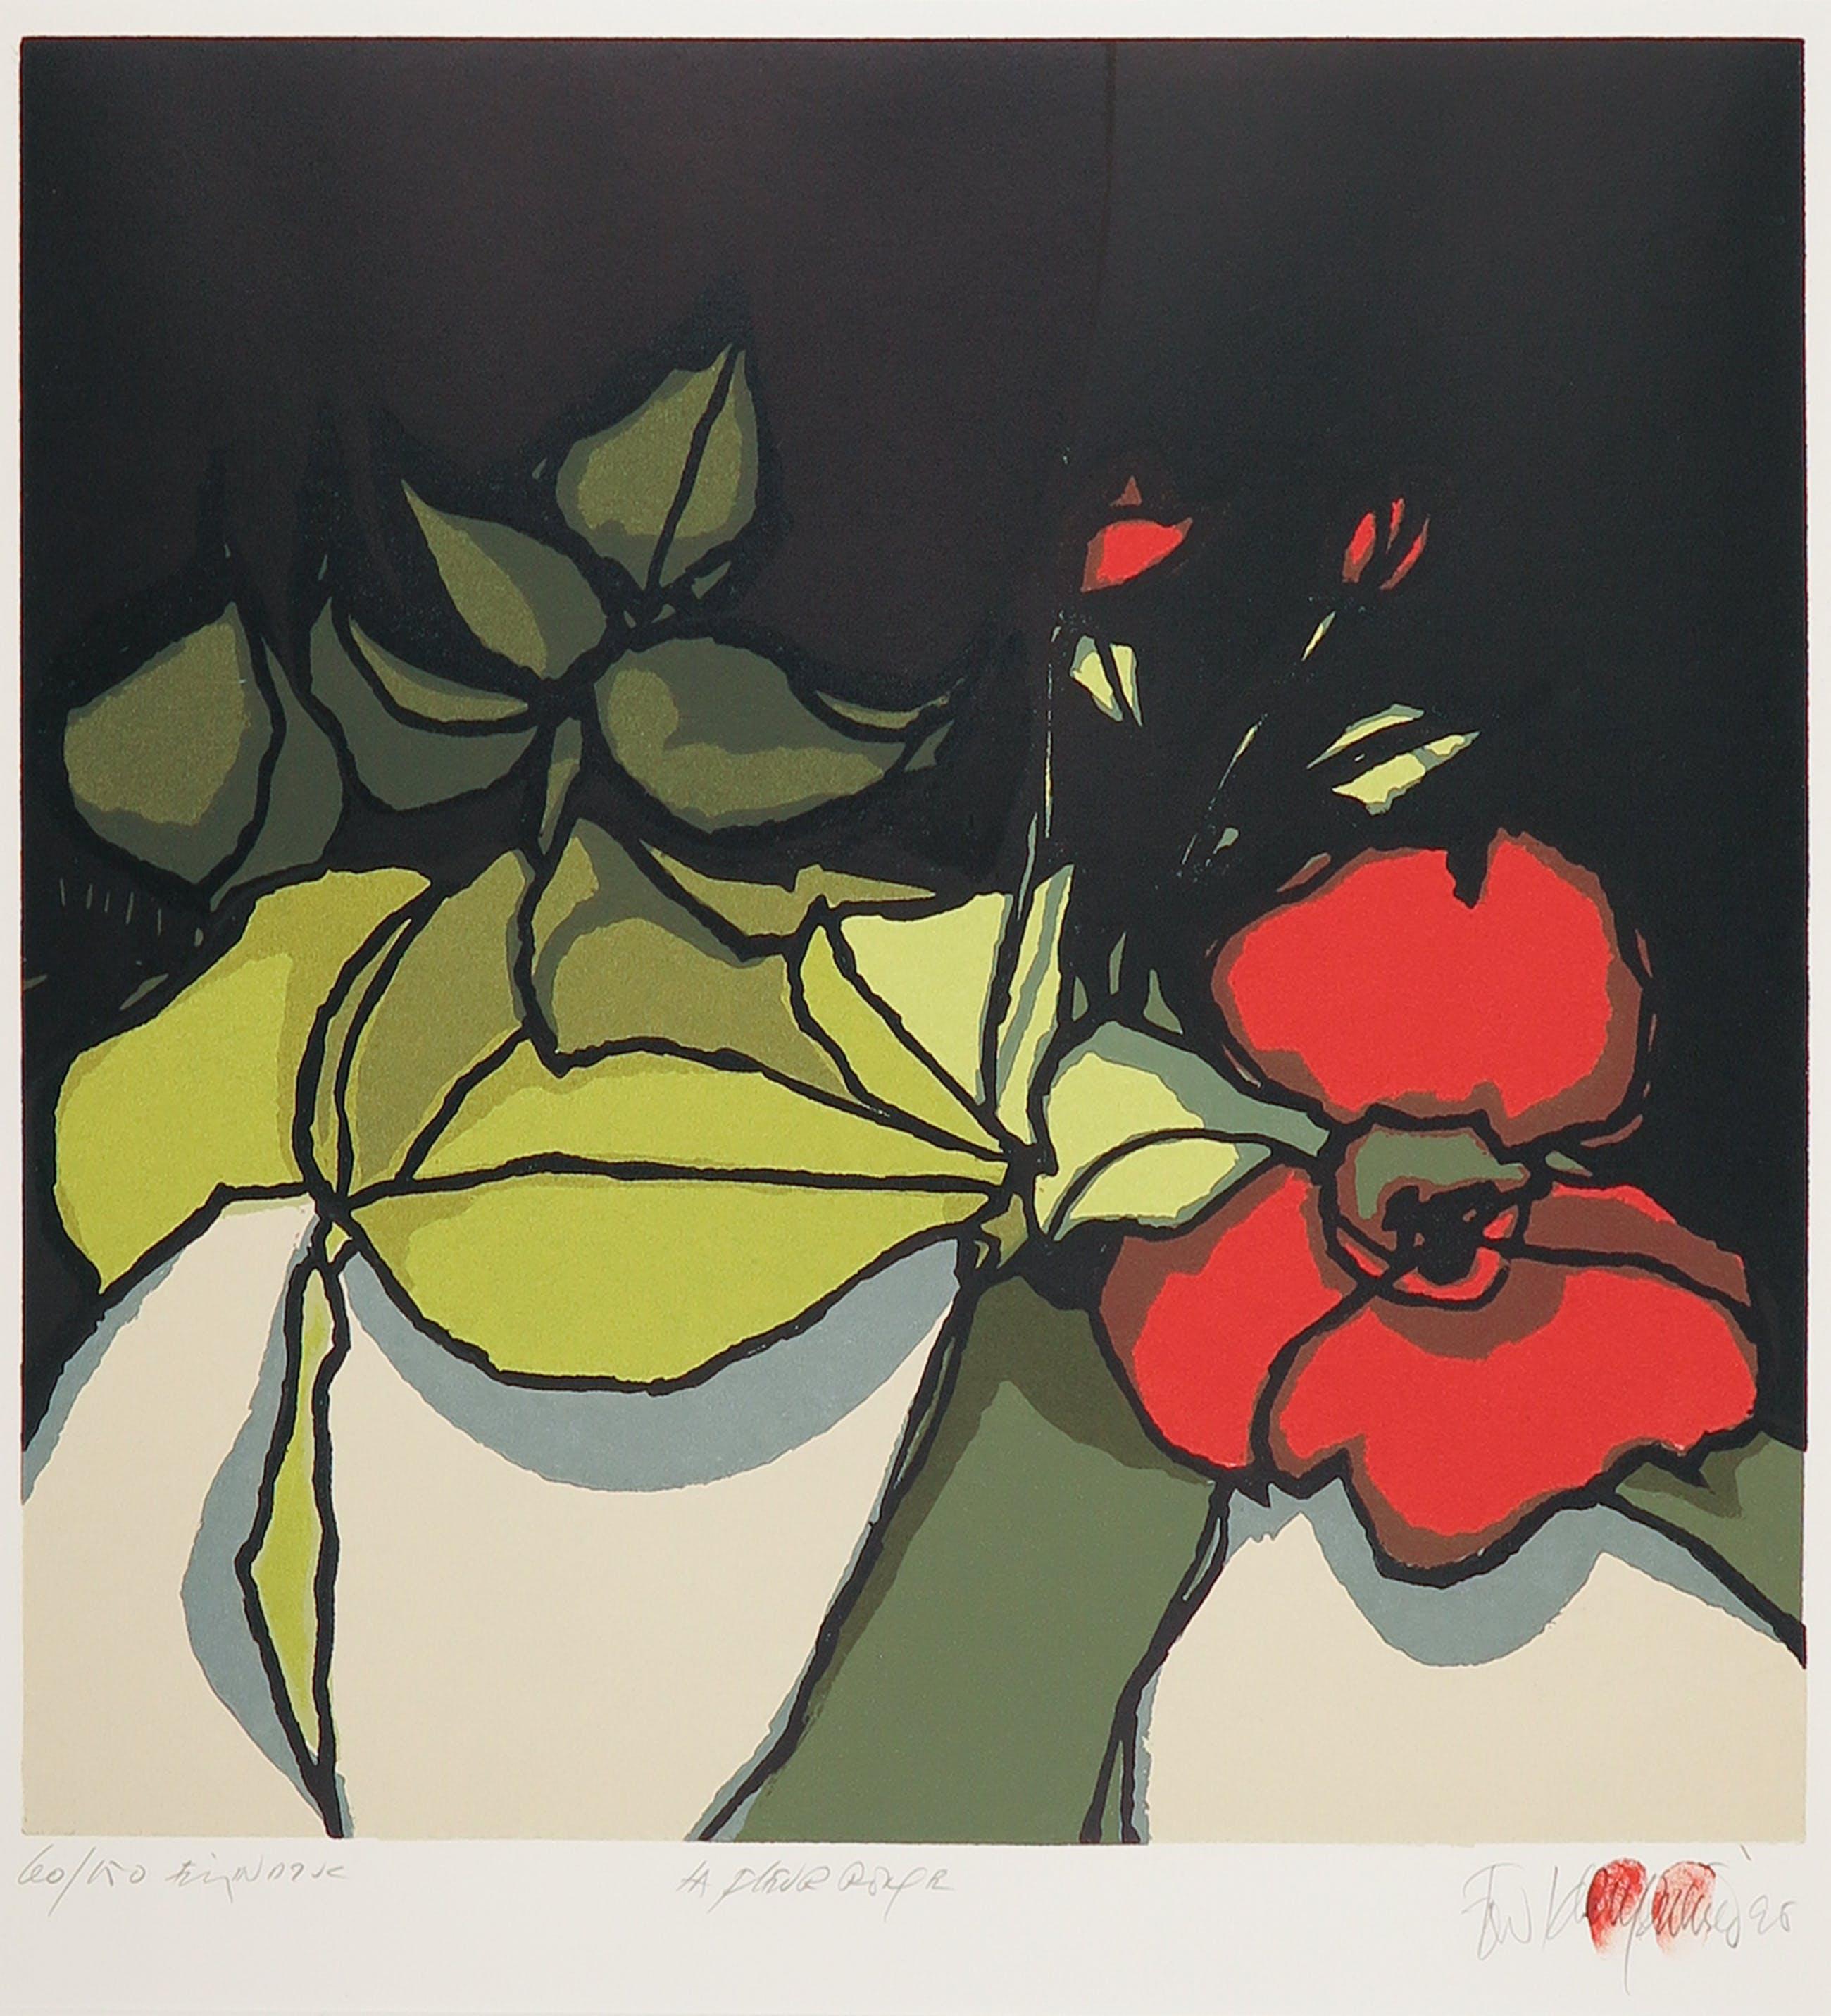 Fon Klement - Boardsnede, La fleur rouge kopen? Bied vanaf 80!